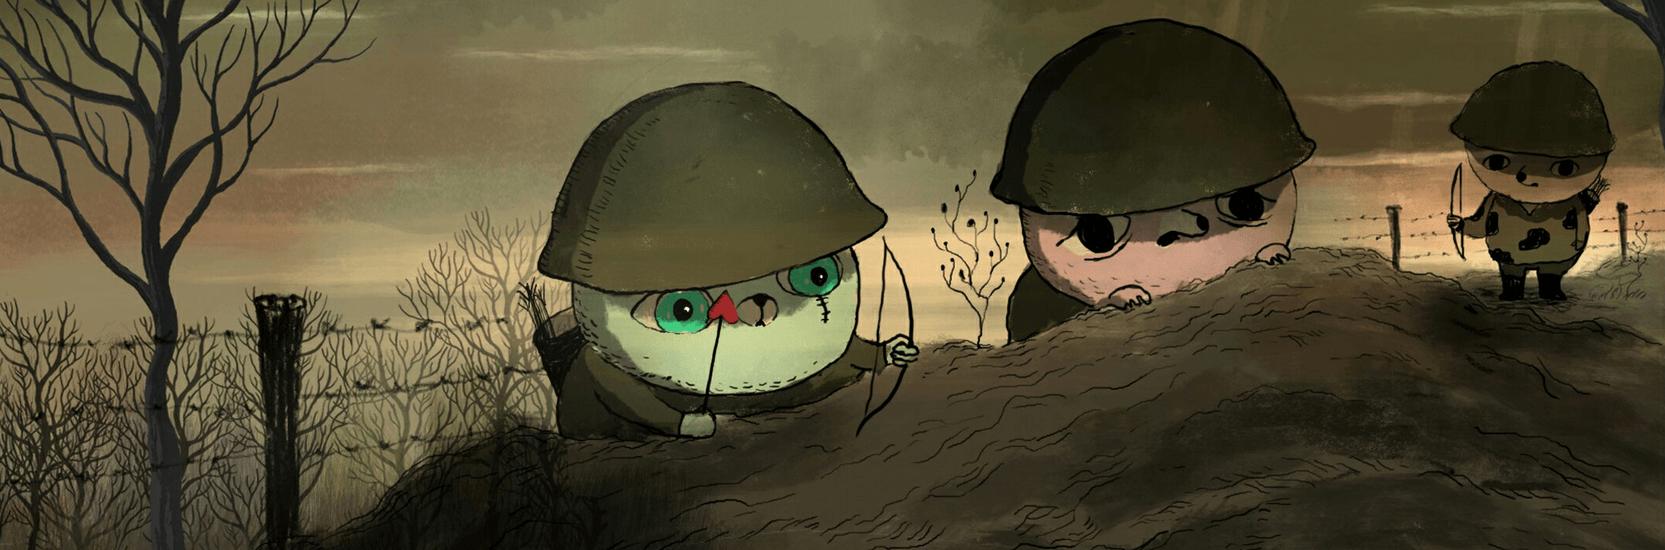 Cartoon Movie 2018 – Unicorn Wars